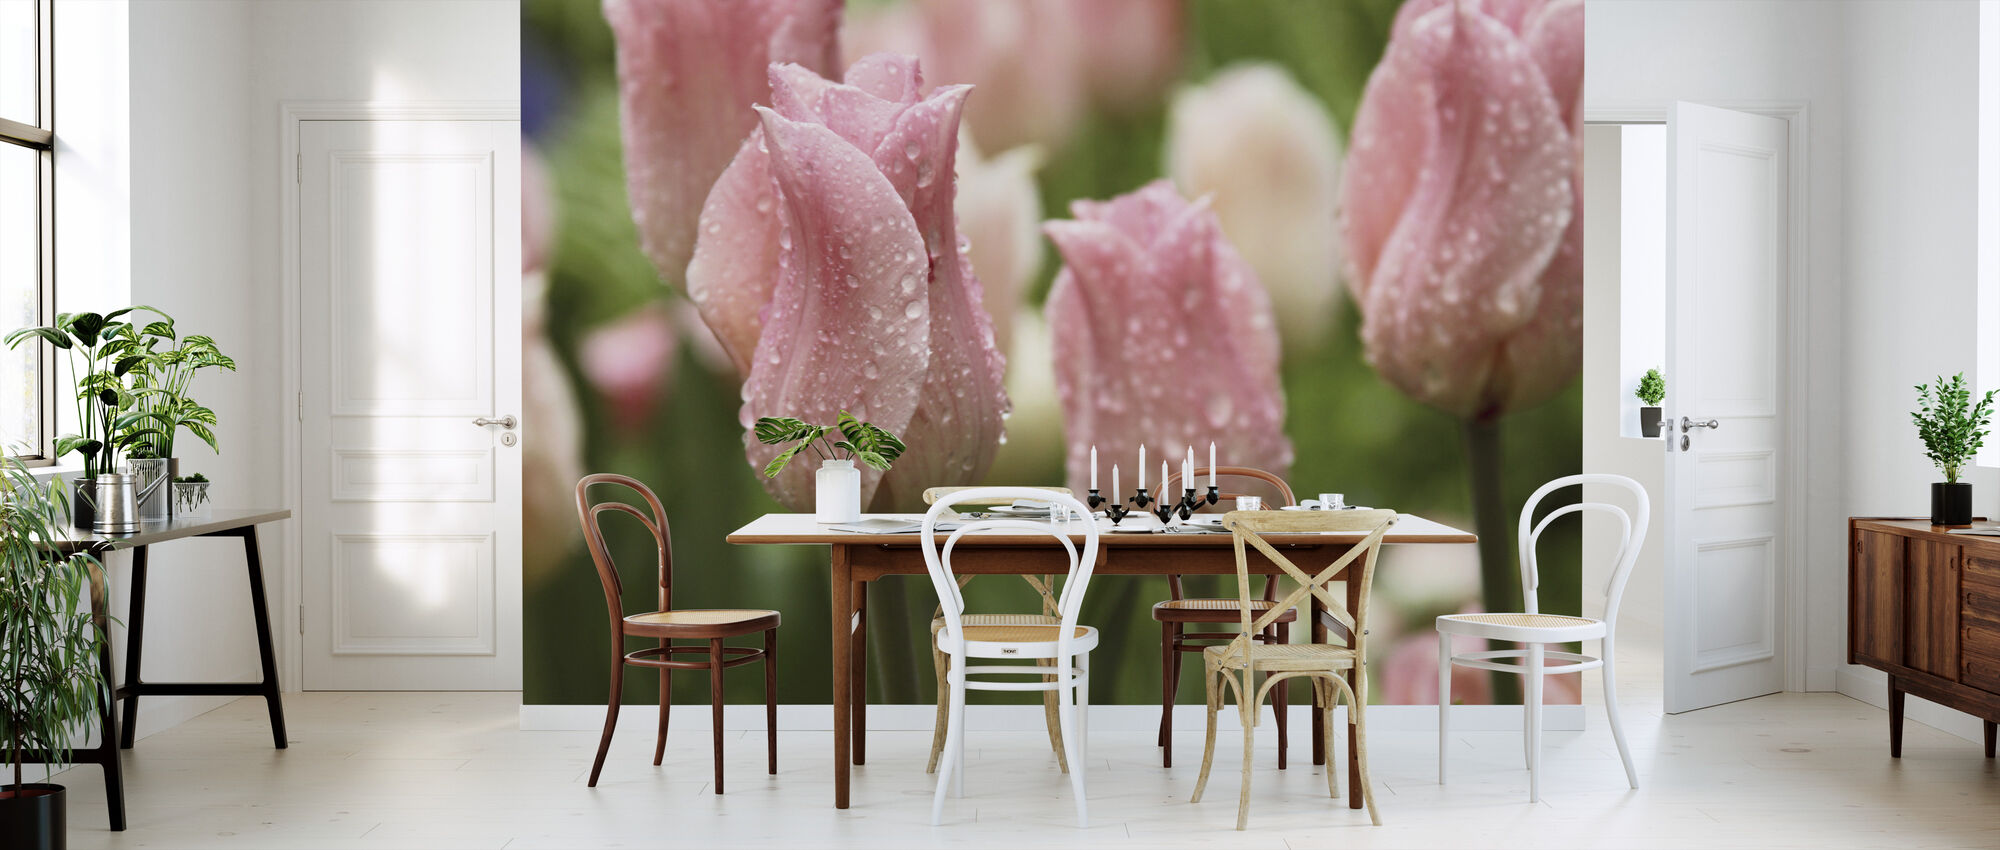 Tulpen Na Regen - Behang - Keuken